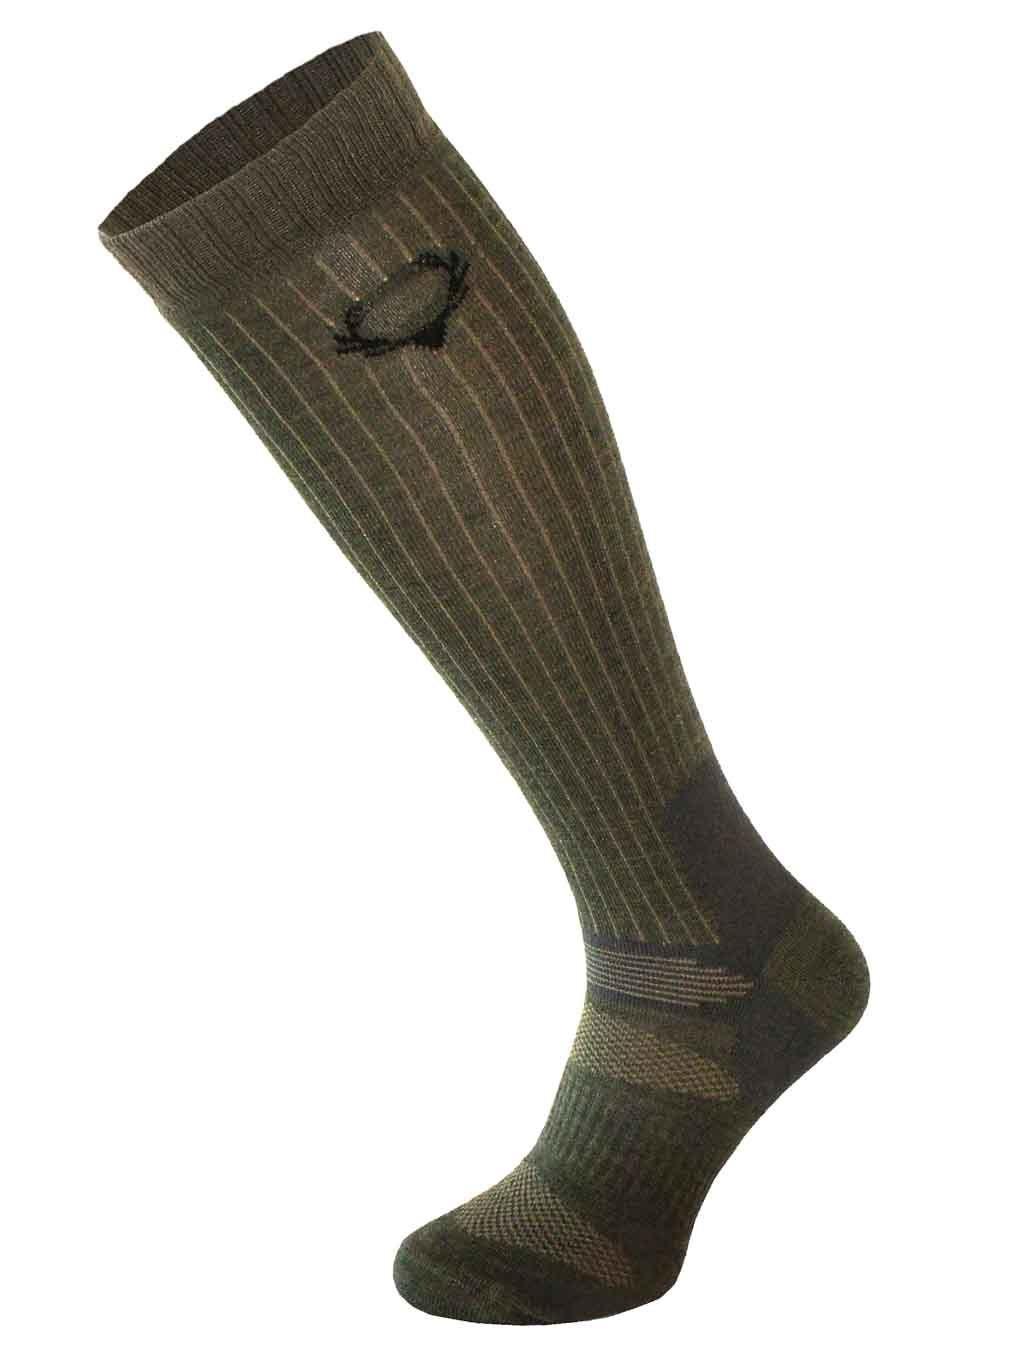 Merino Wool Long Performance Shooting Hunting Socks